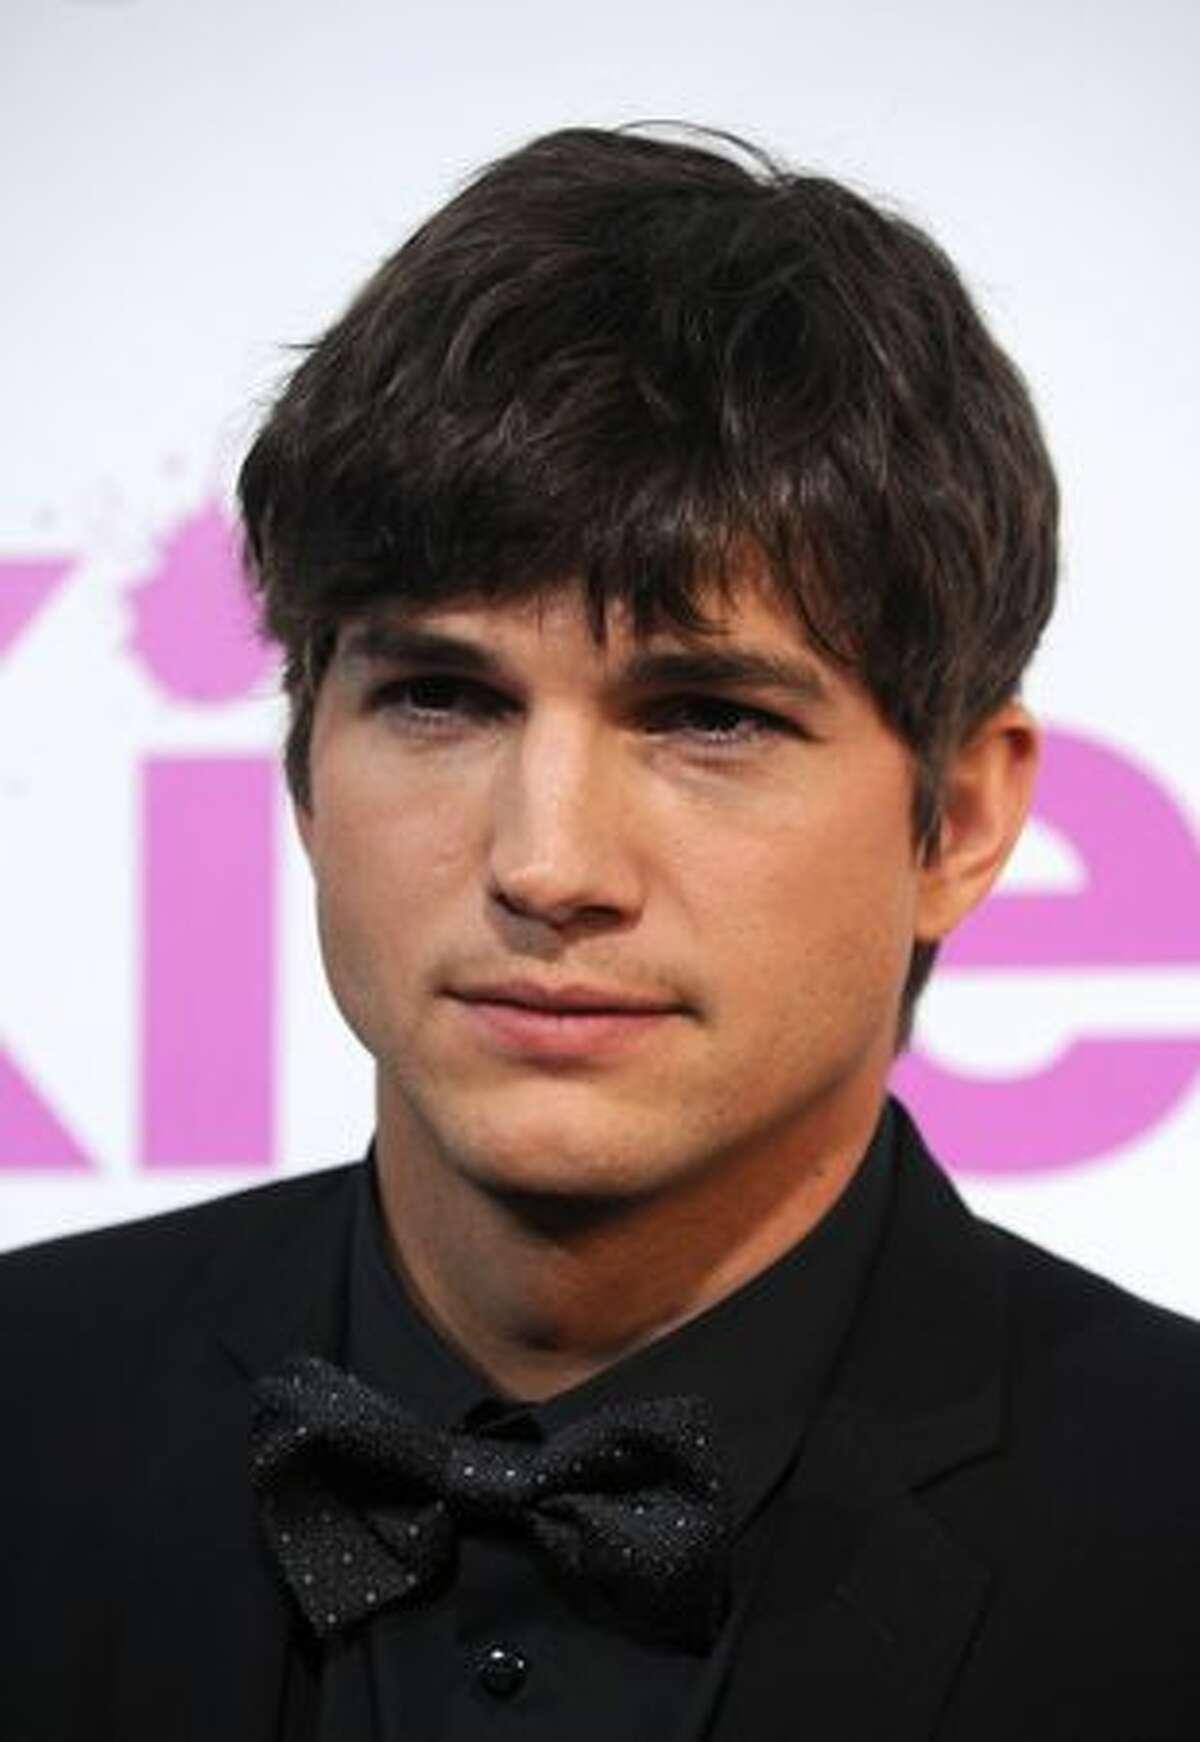 Actor Ashton Kutcher arrives to the premiere of Lionsgate's